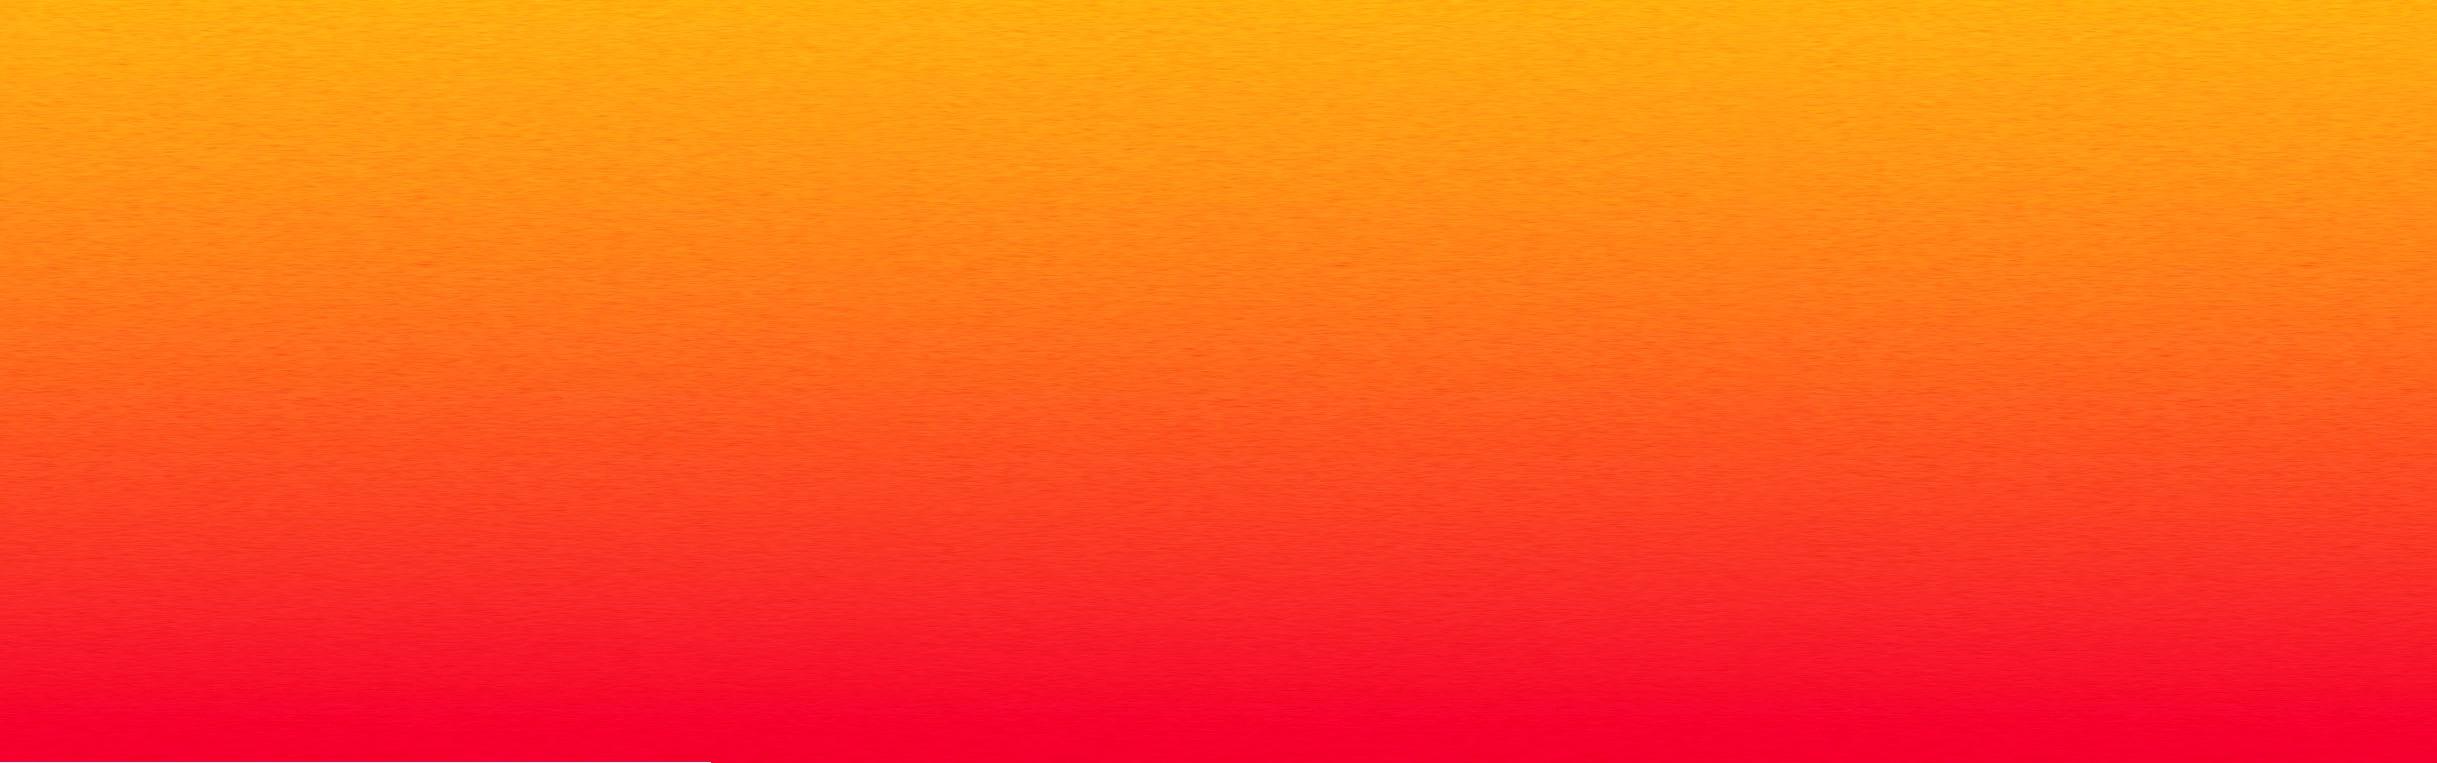 Orange Dark Pink Maroon Red Wallpaper Mixed Gradient